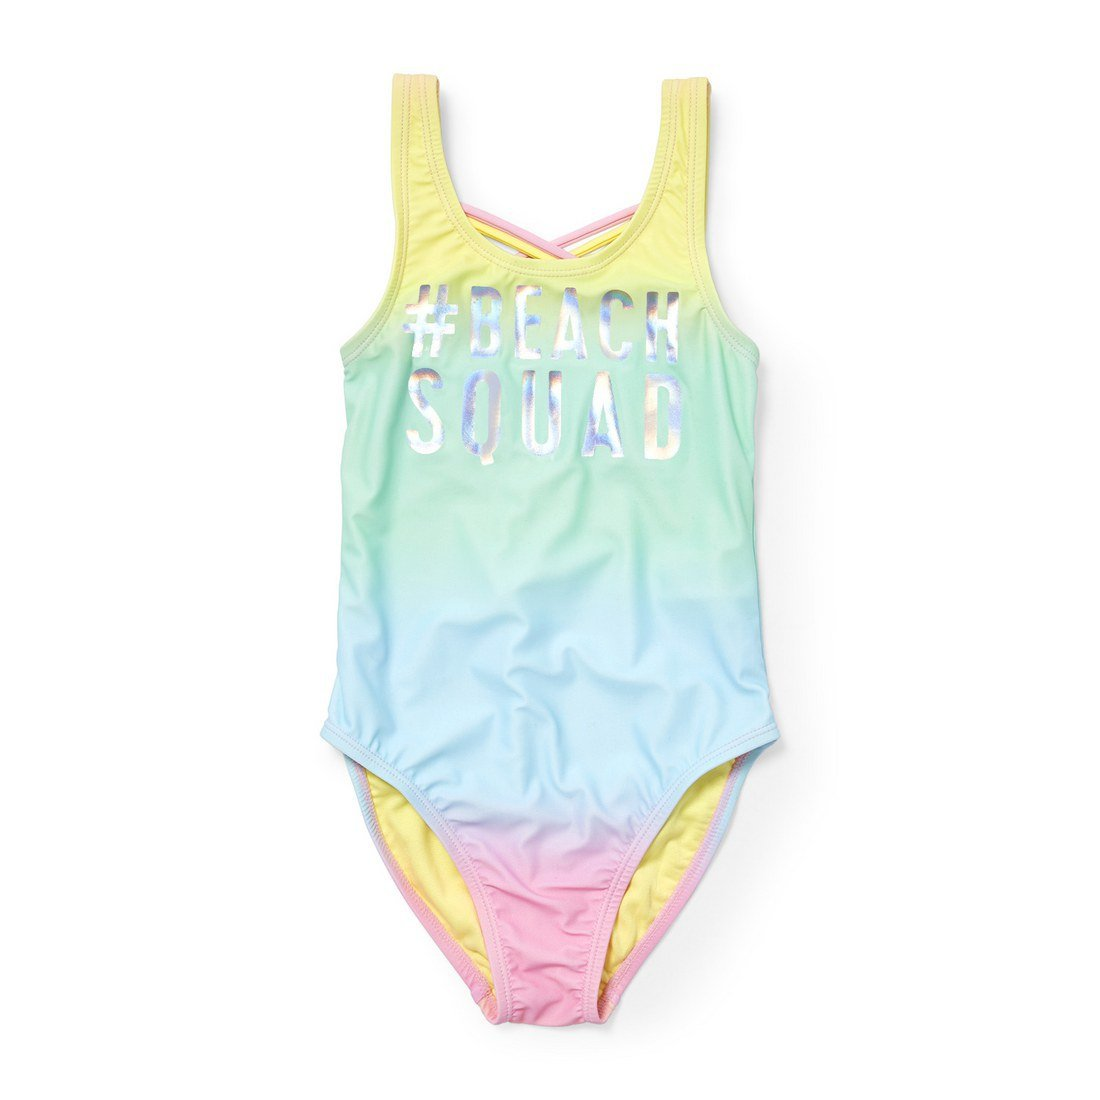 The Children's Place Big Girls' One Piece Swim Suit, Arizona Sun 4255, XS (4)